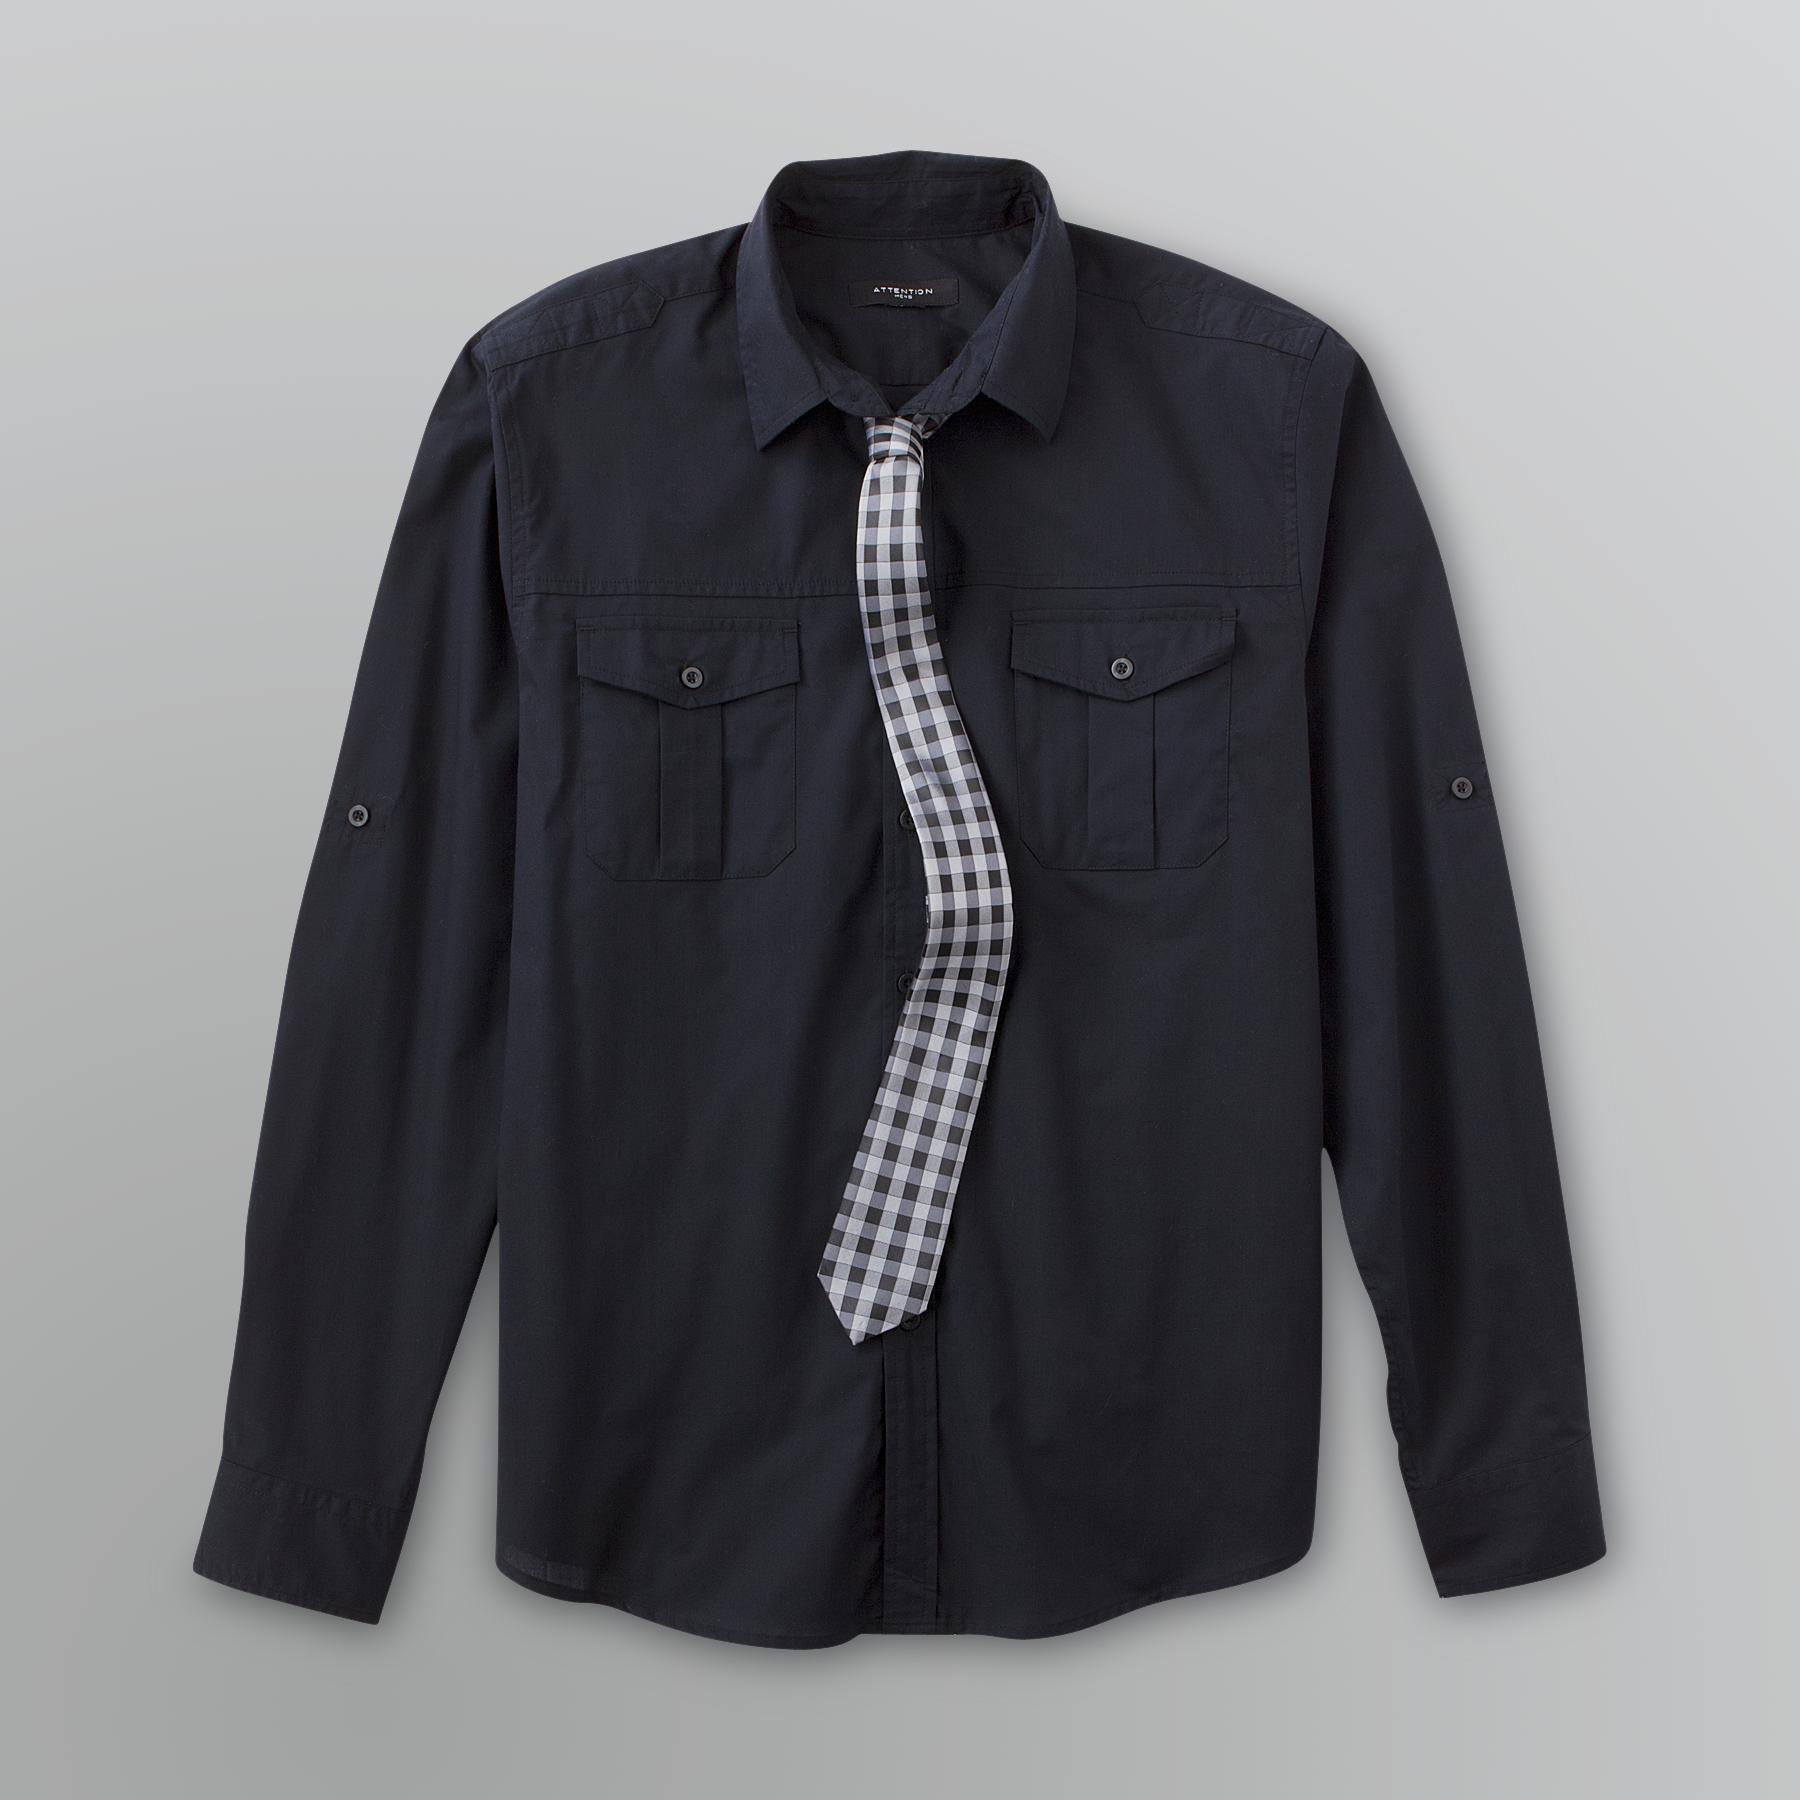 Attention Men's Dress Shirt & Tie Set